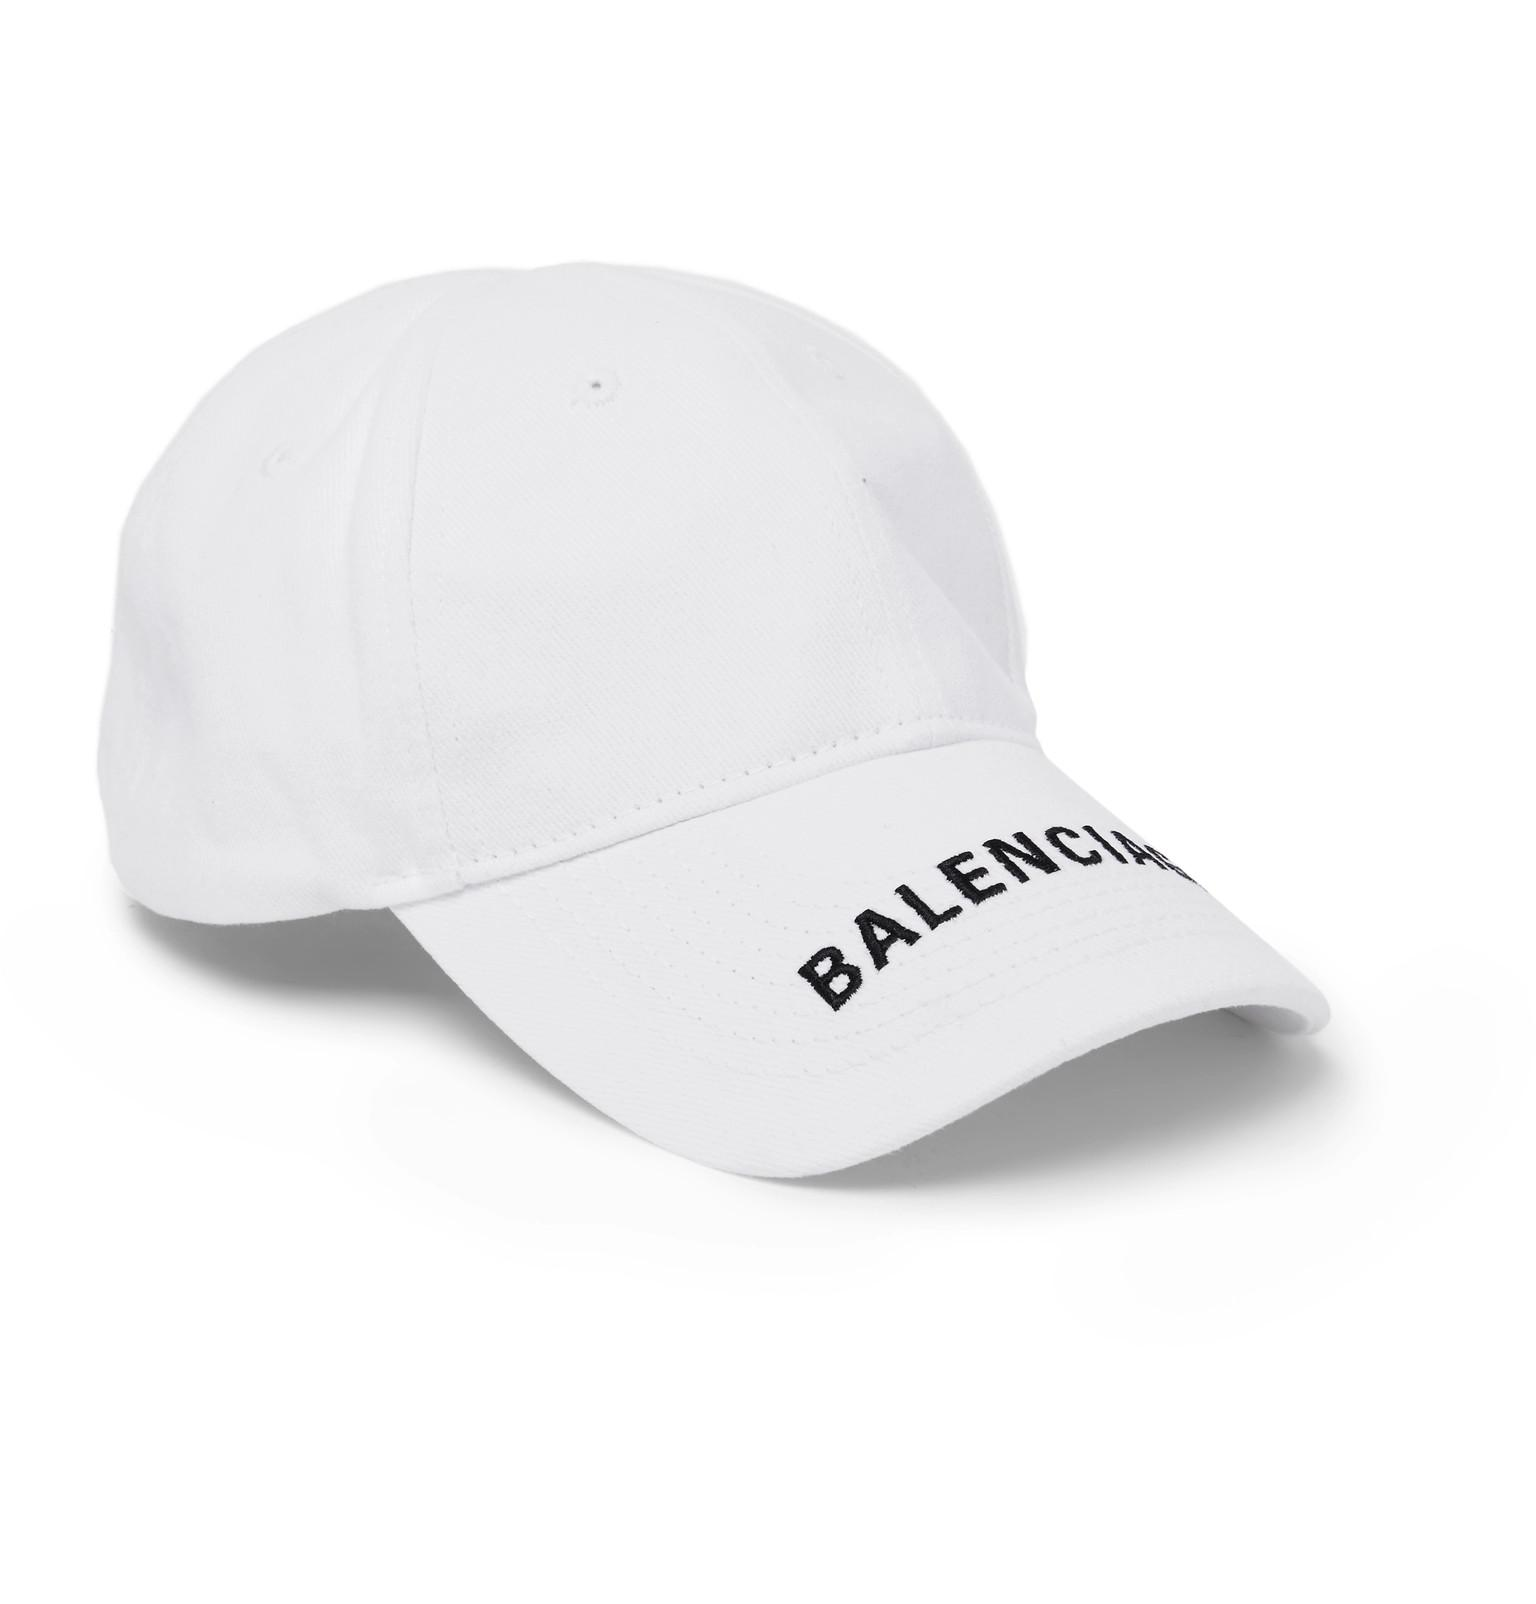 Balenciaga Cap in White - Save 69% - Lyst c1c0d7eba90